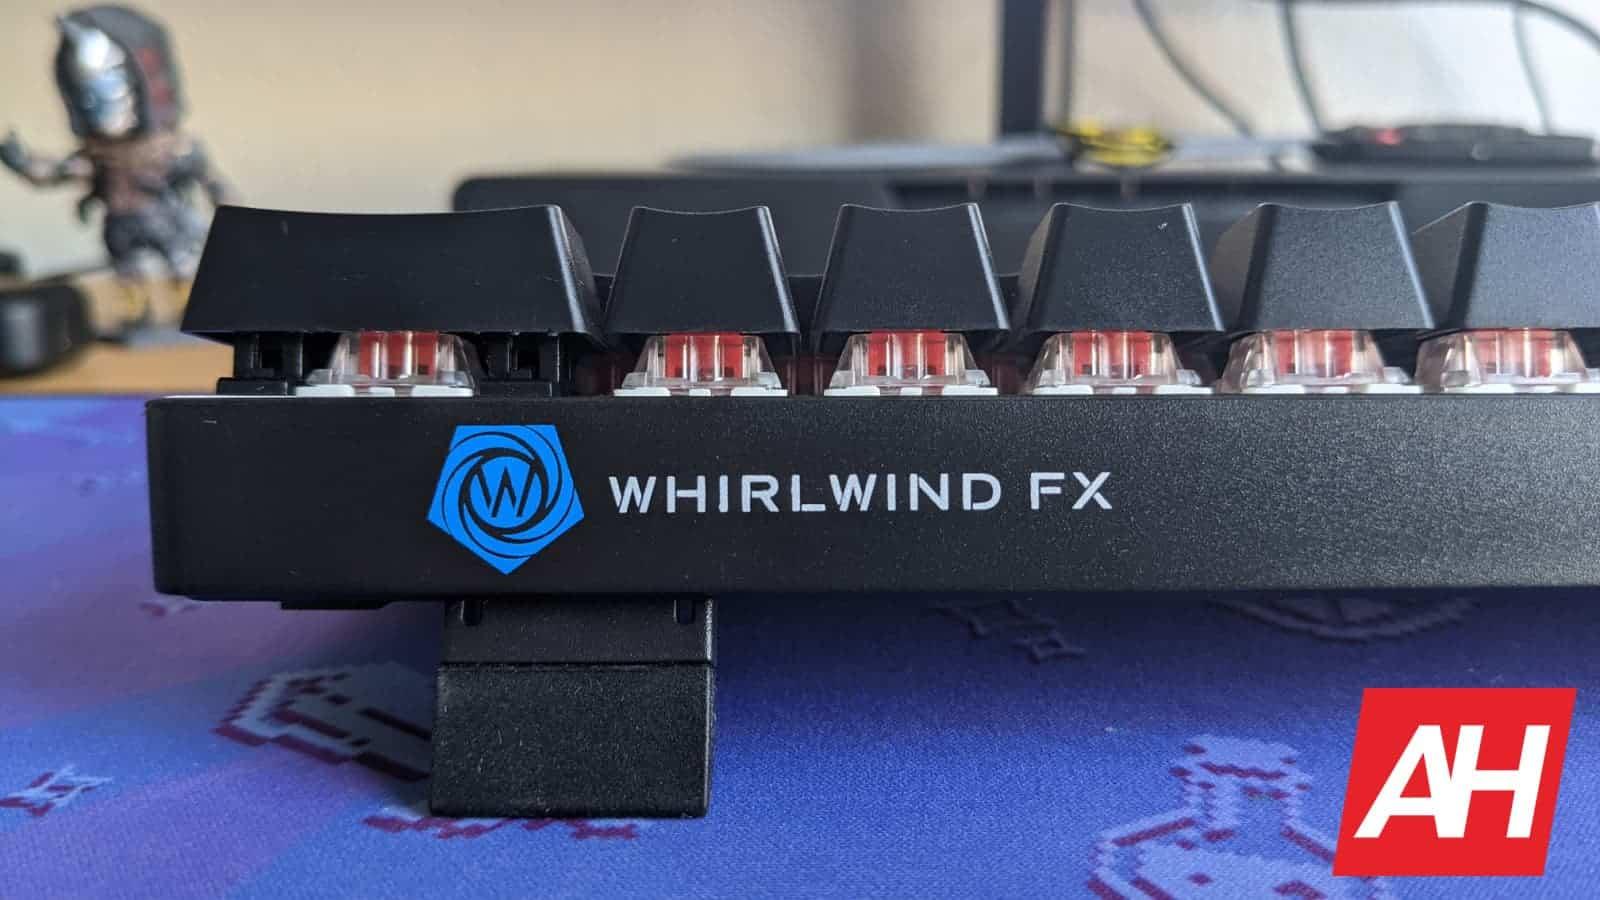 WhirlwindFX Atom 60 Gaming Keyboard Review 4